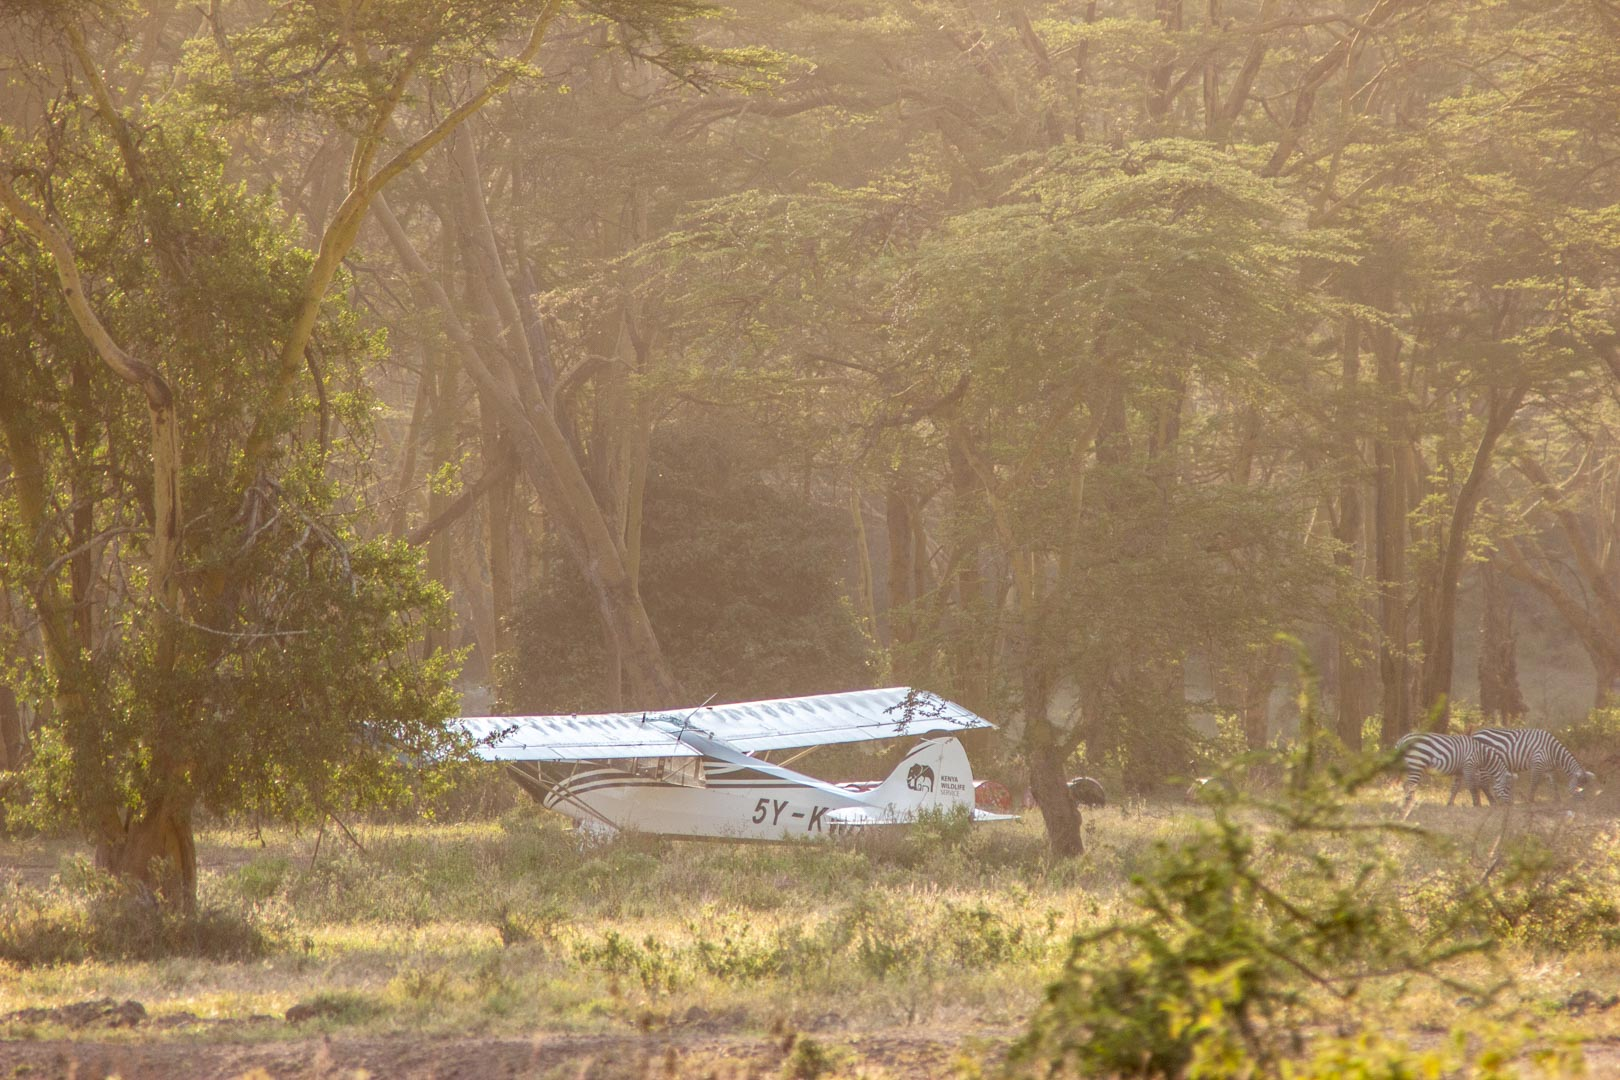 Avioneta en Parque Nacional Lago Nakuru, Kenia